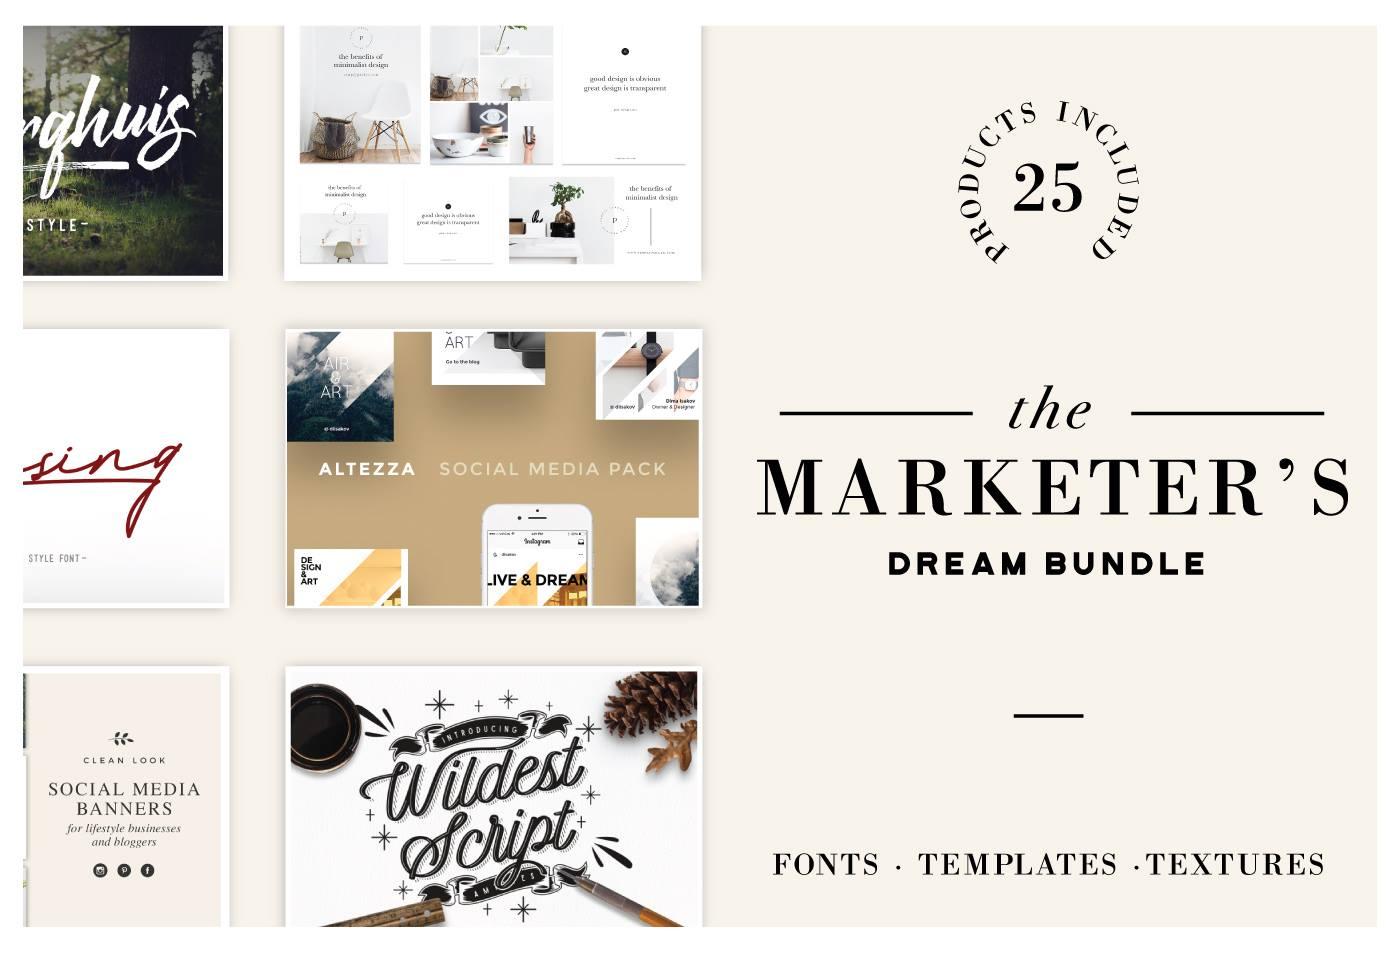 The Marketer's Dream Bundle